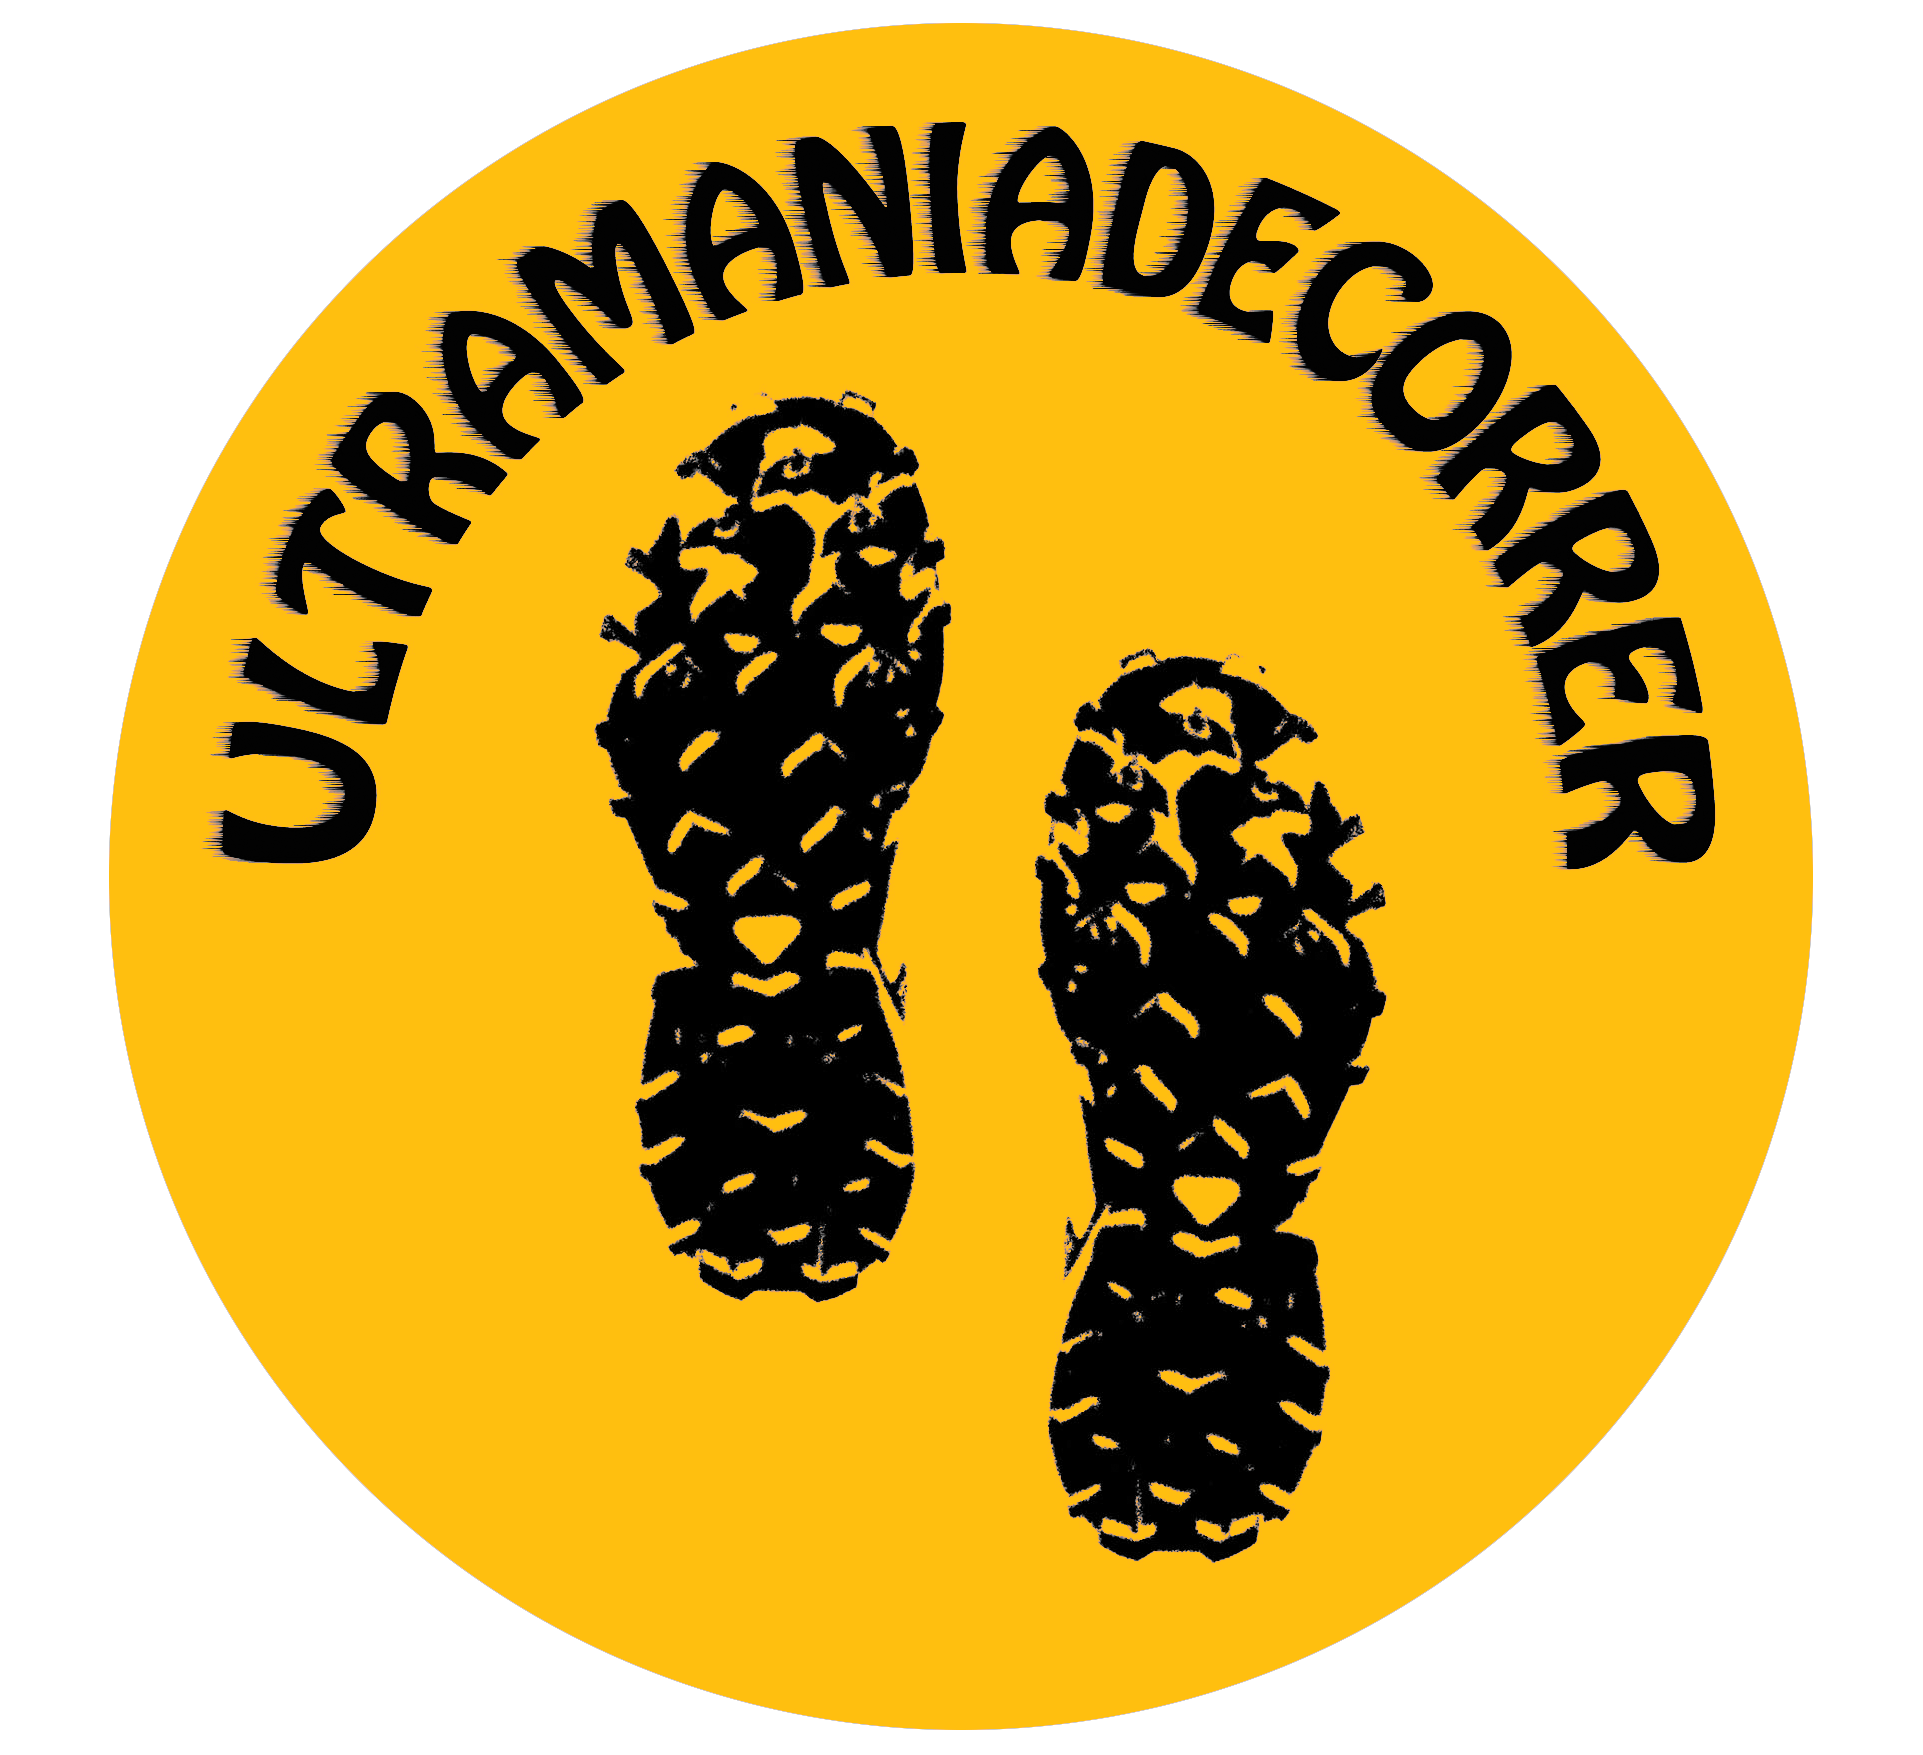 ULTRAMANIADECORRER